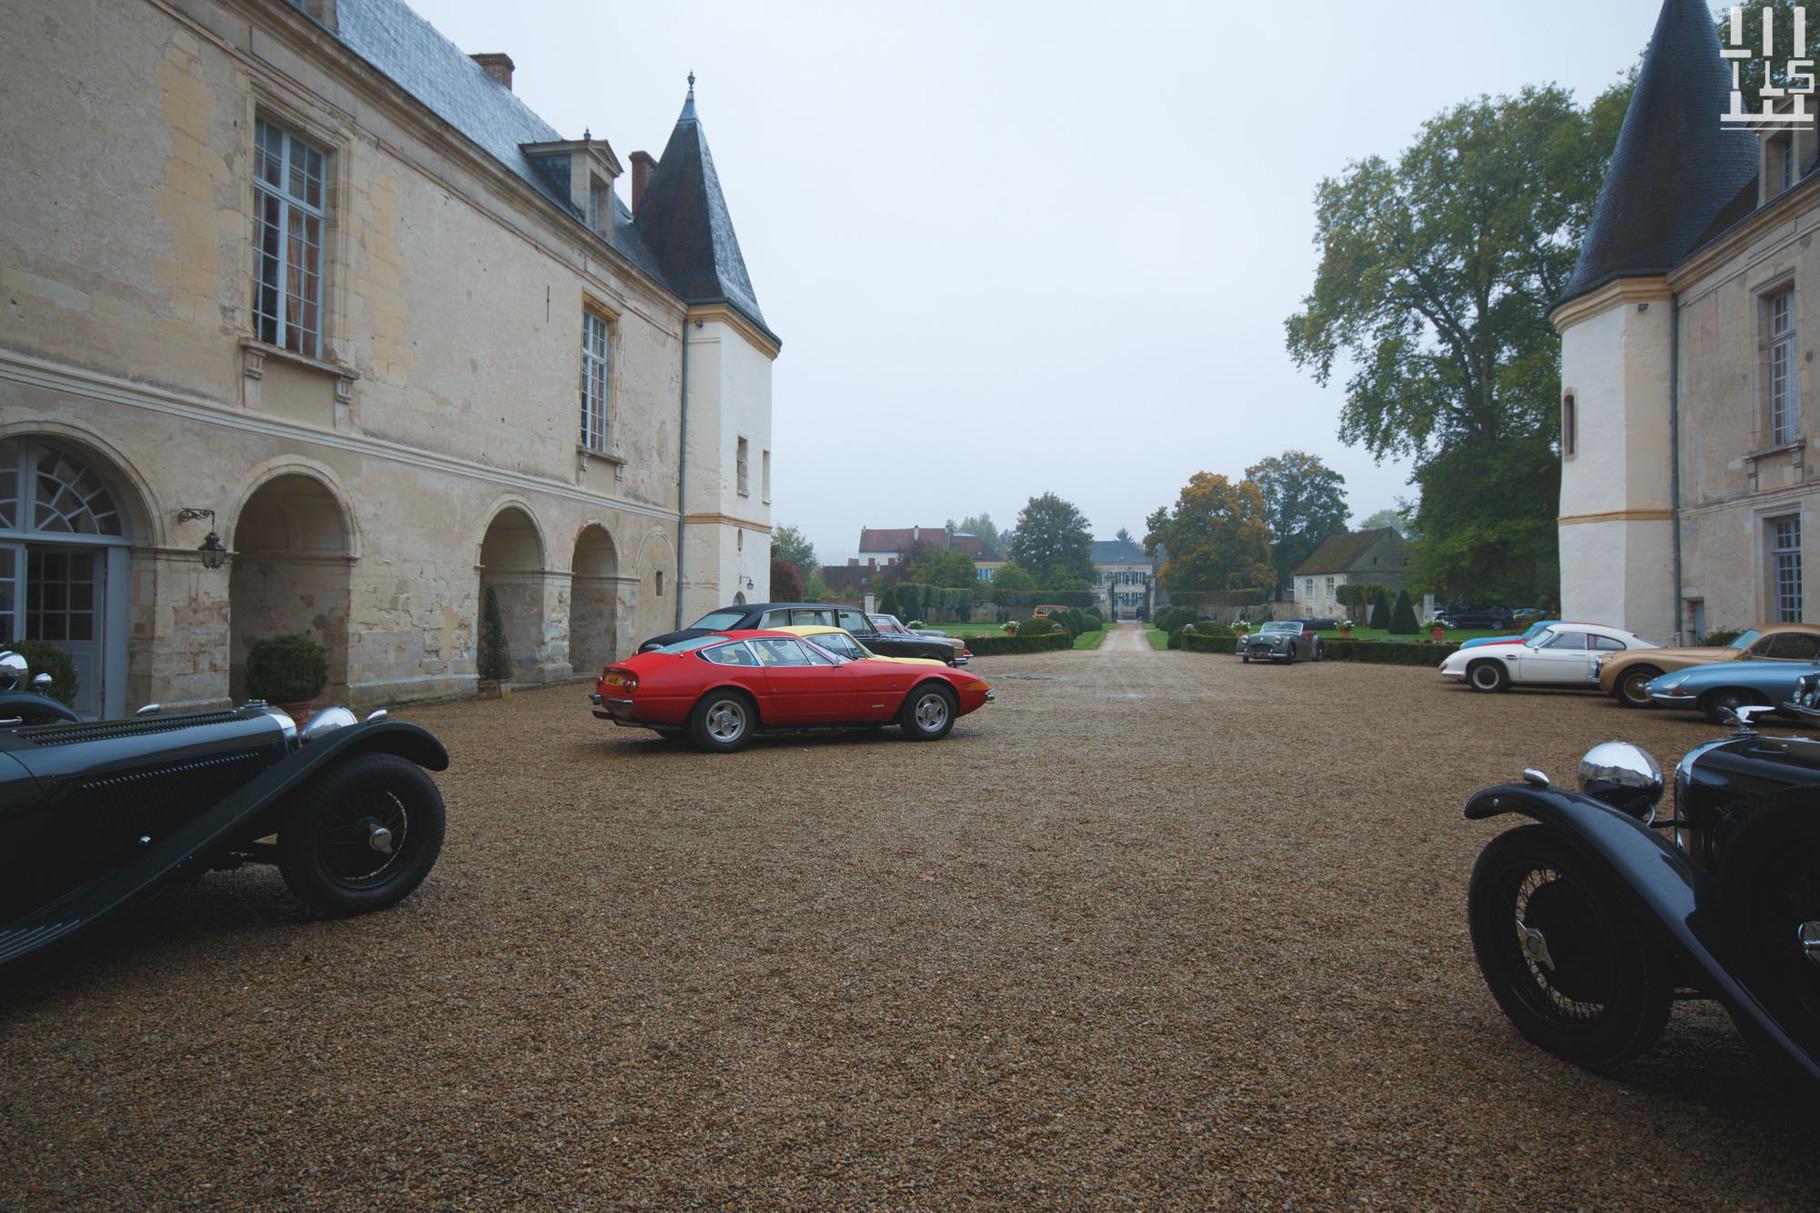 Ferrari 365 GTB/4 Daytona - Journées d'Automne 2015, Château de Condé.